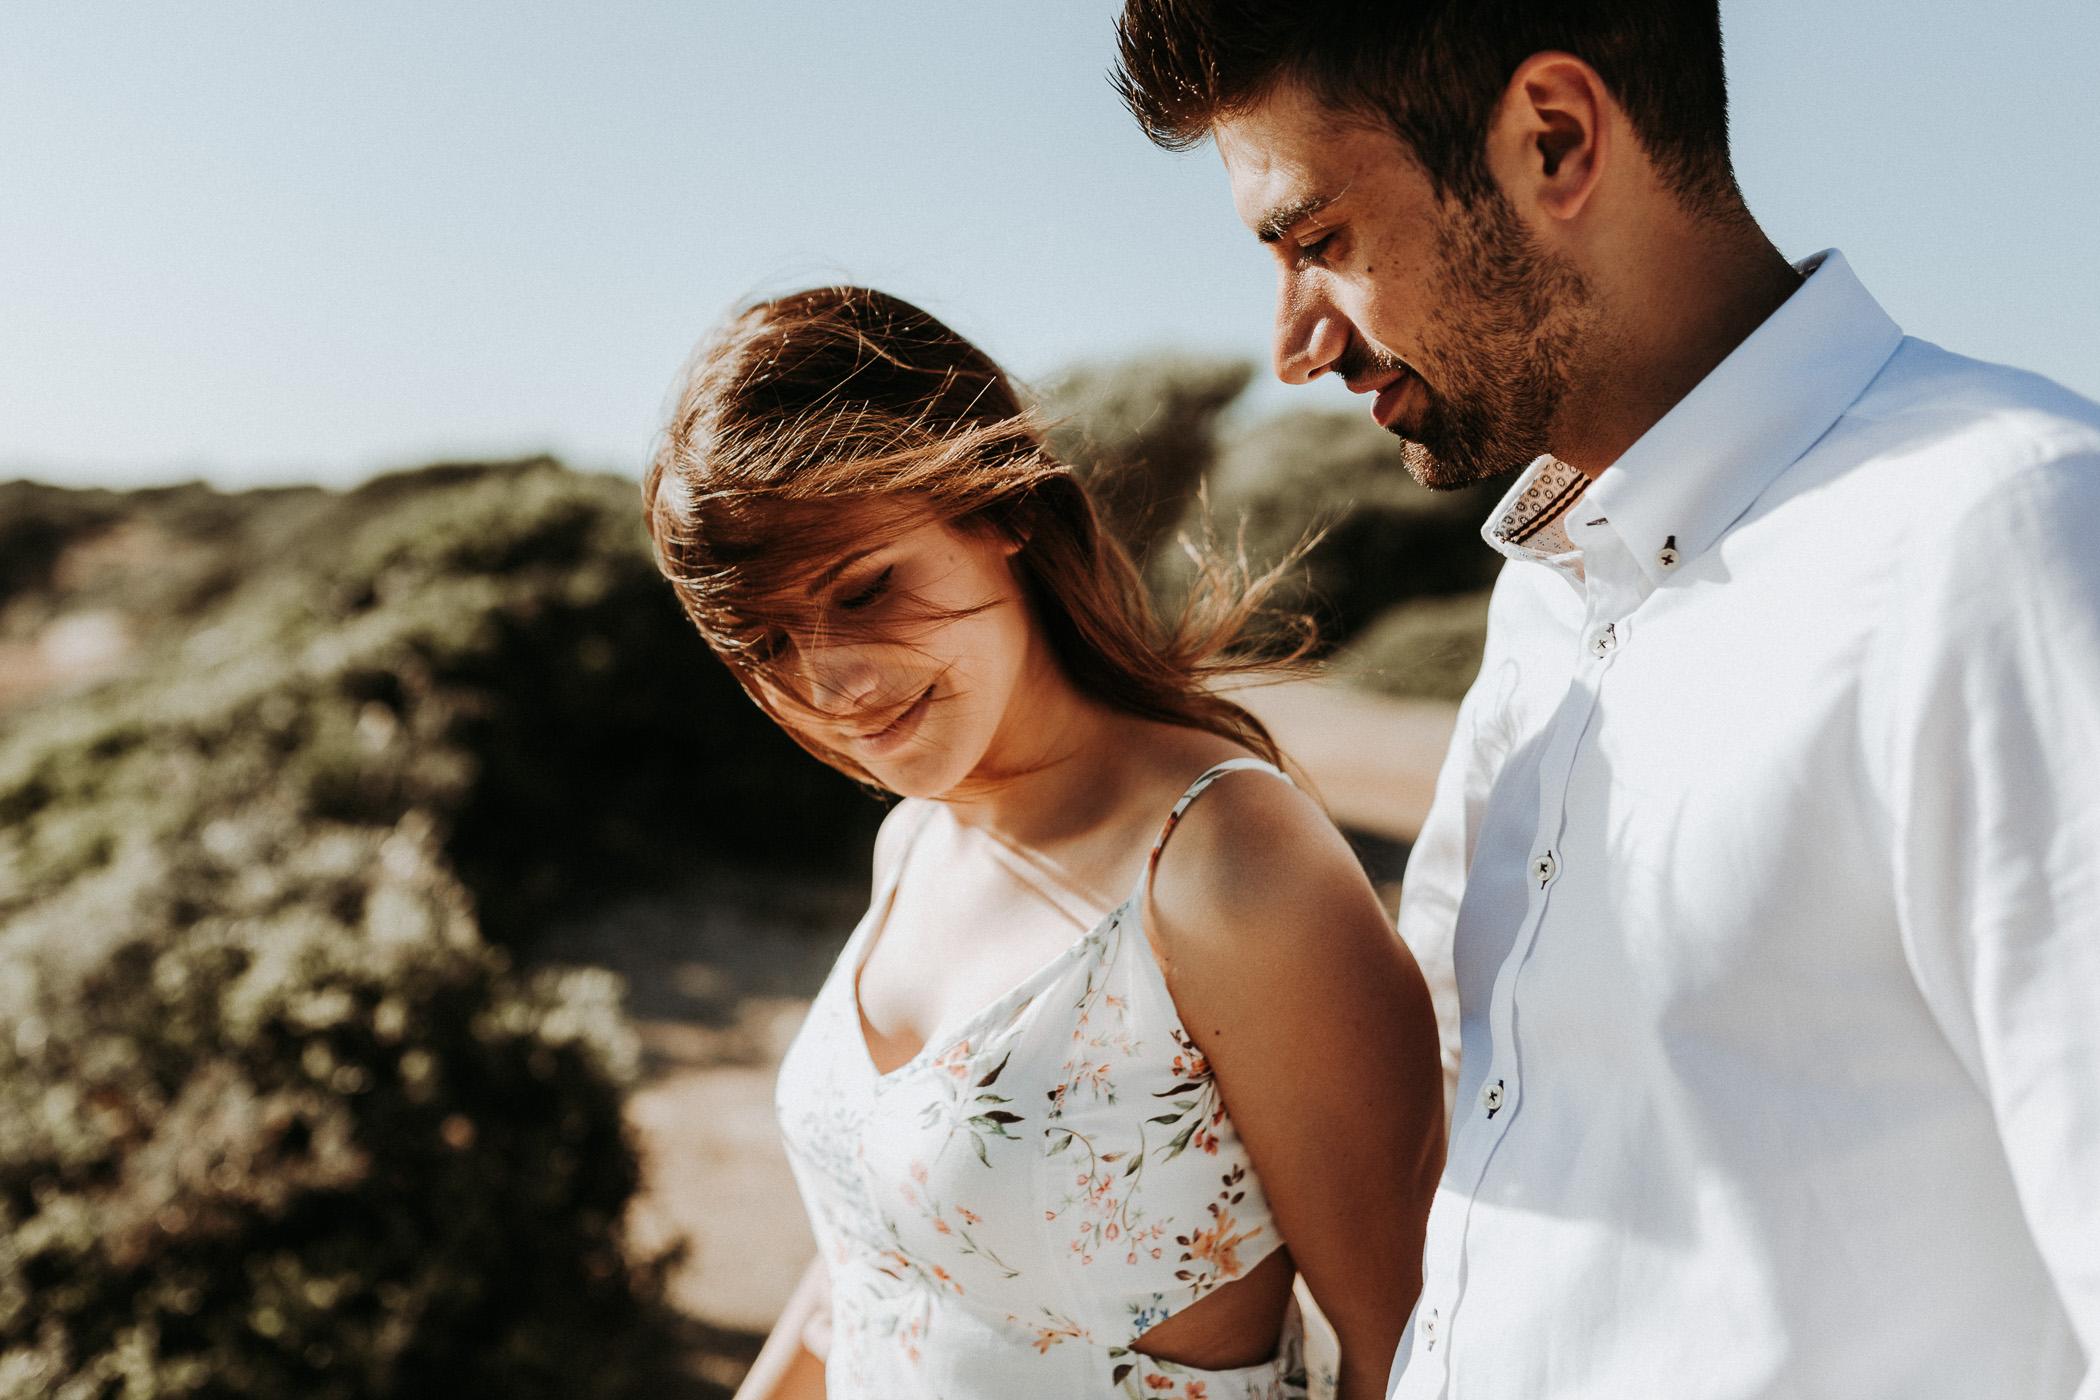 DanielaMarquardtPhotography_wedding_elopement_mallorca_spain_calapi_palma_lauraandtoni_19